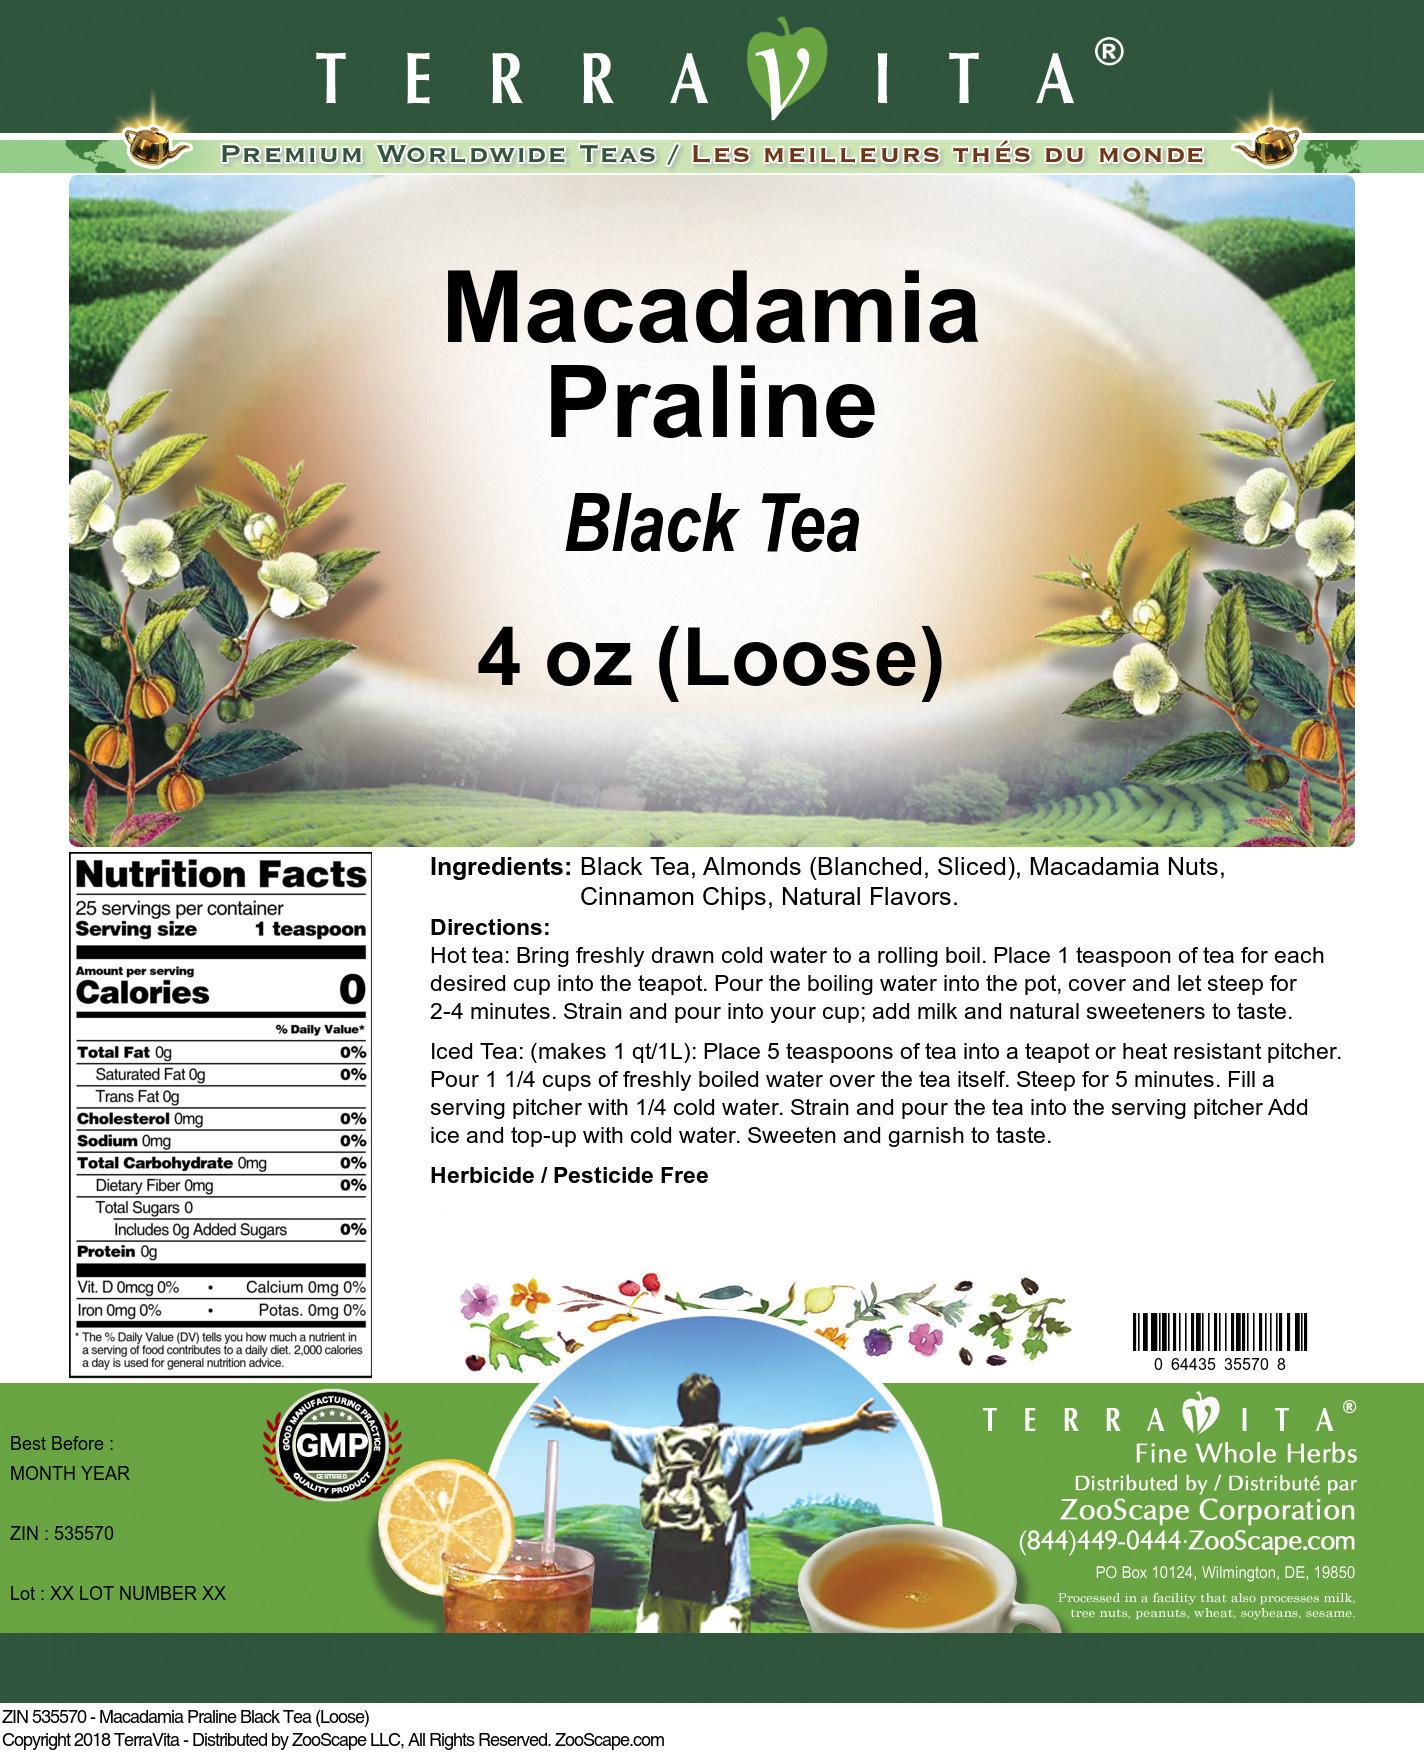 Macadamia Praline Black Tea